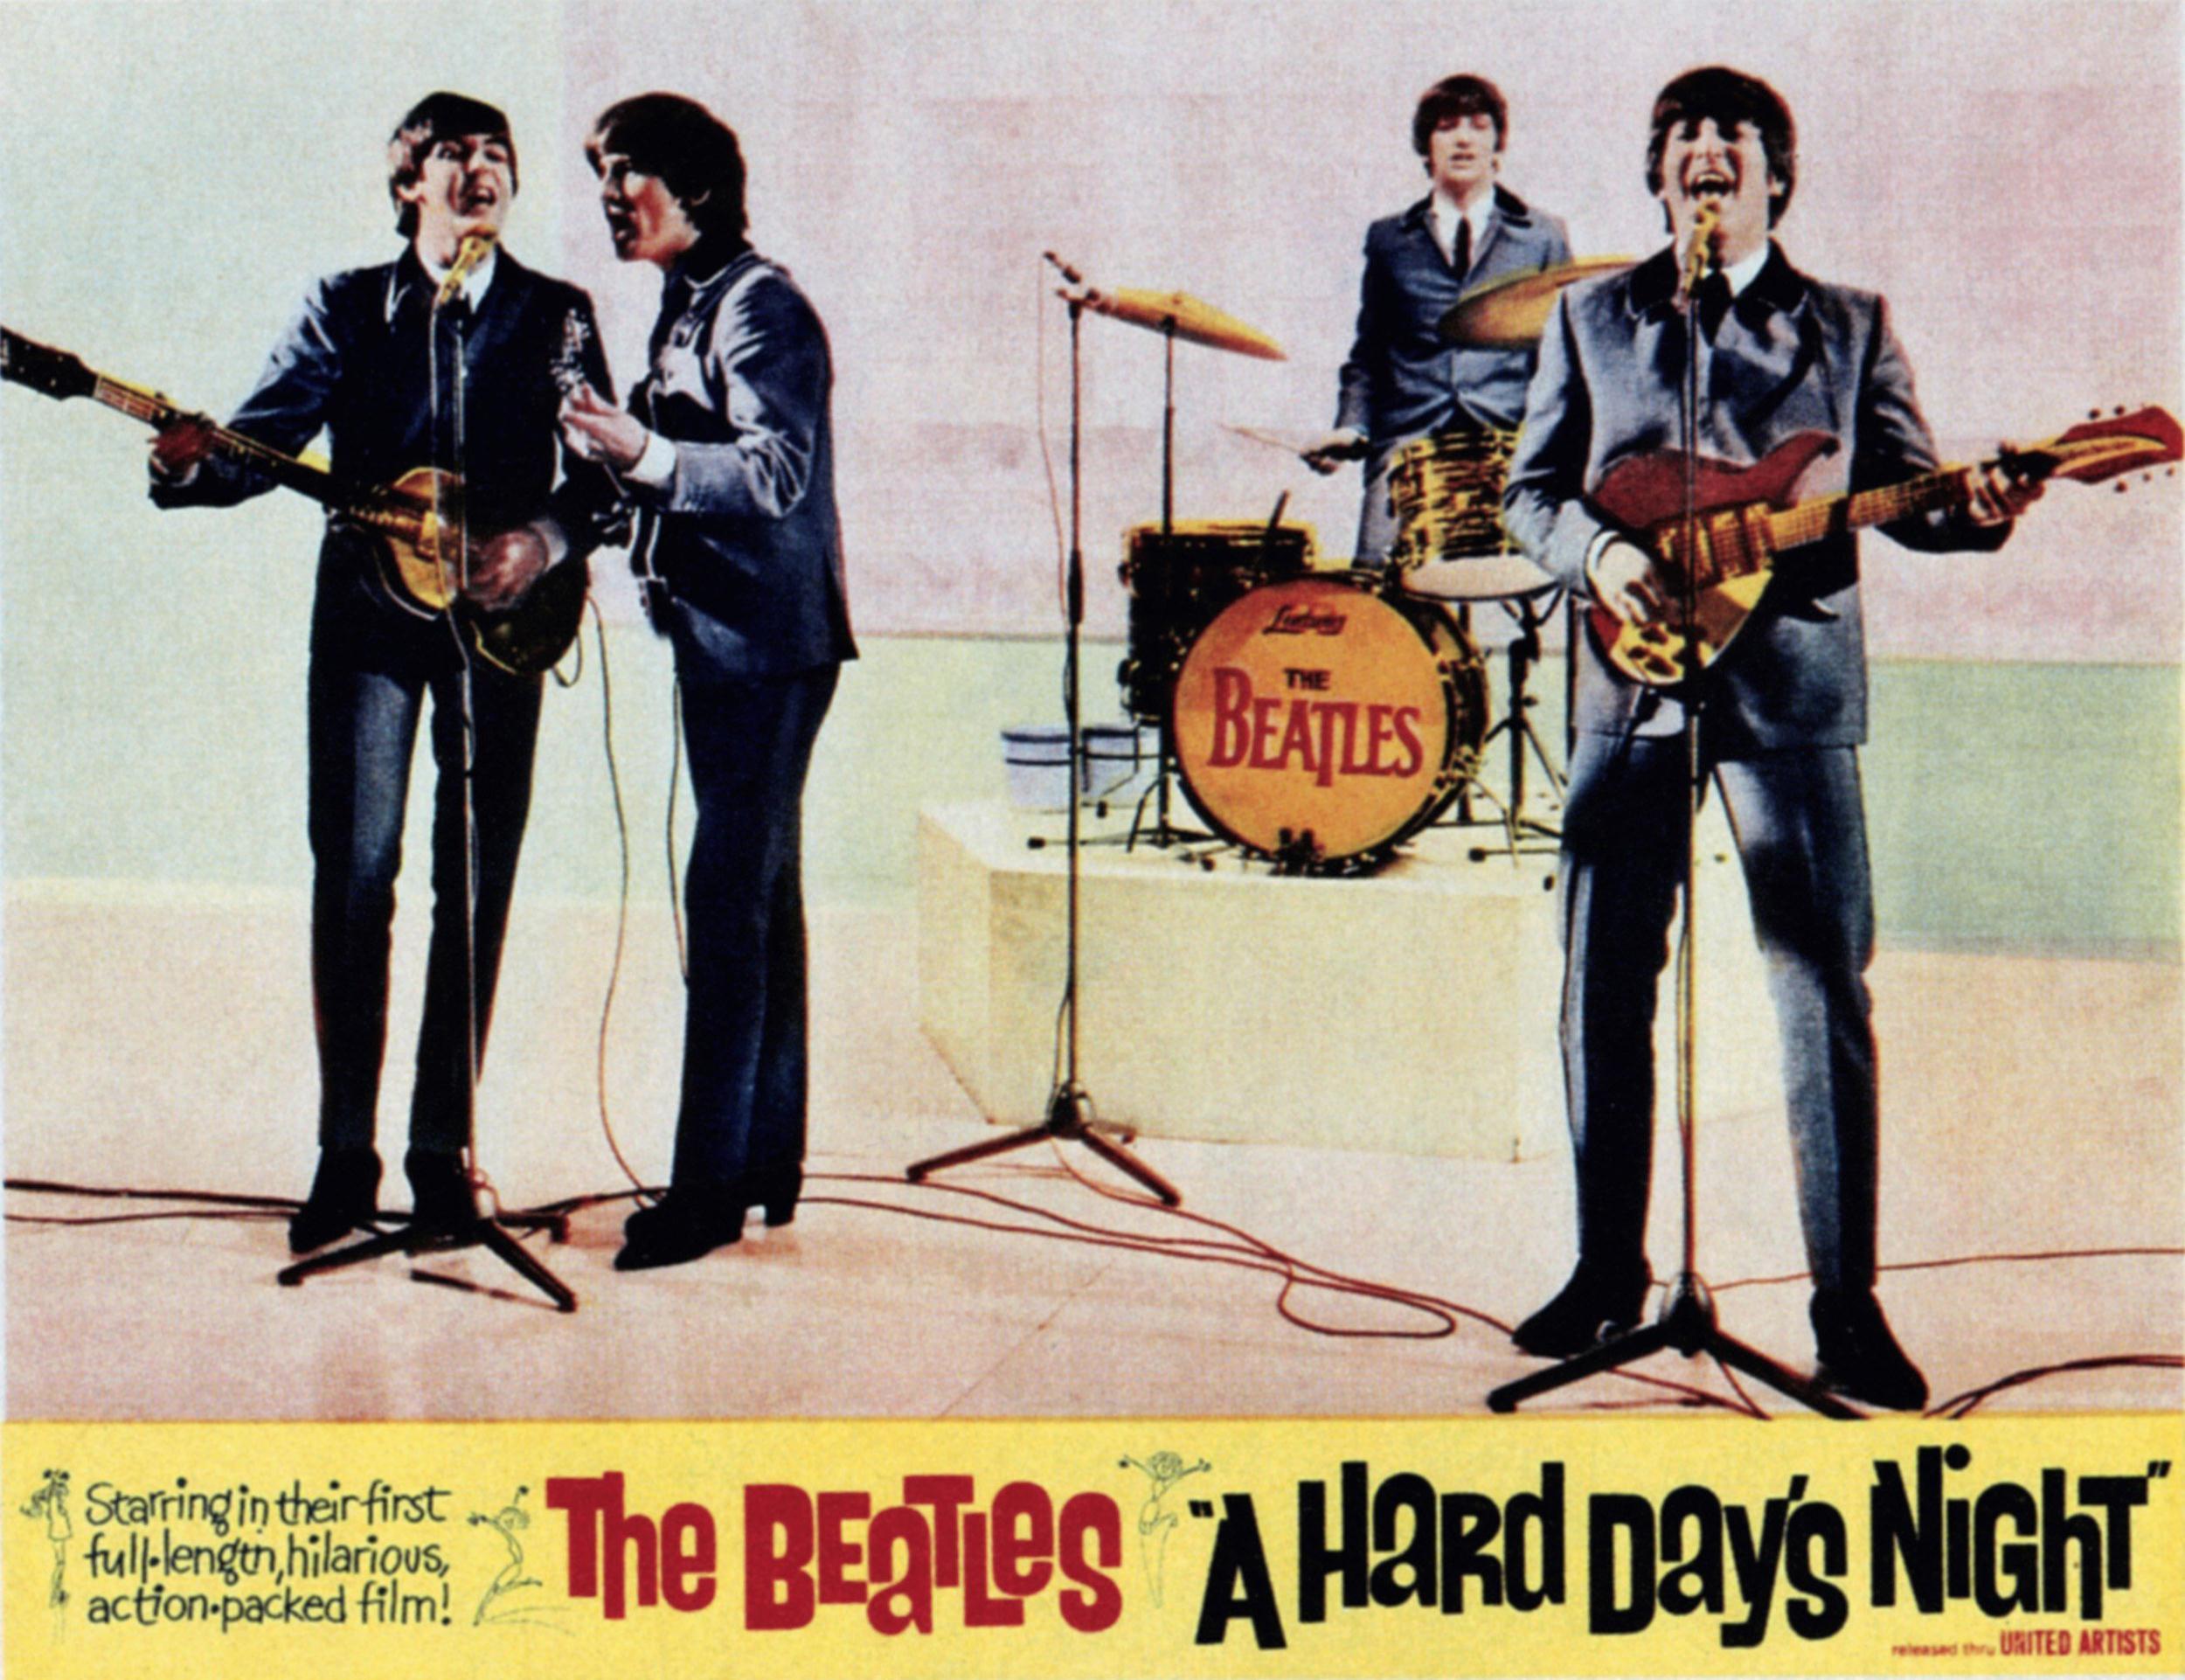 Image: A HARD DAY'S NIGHT, The Beatles from left: Paul McCartney, George Harrison, Ringo Starr, John Lennon